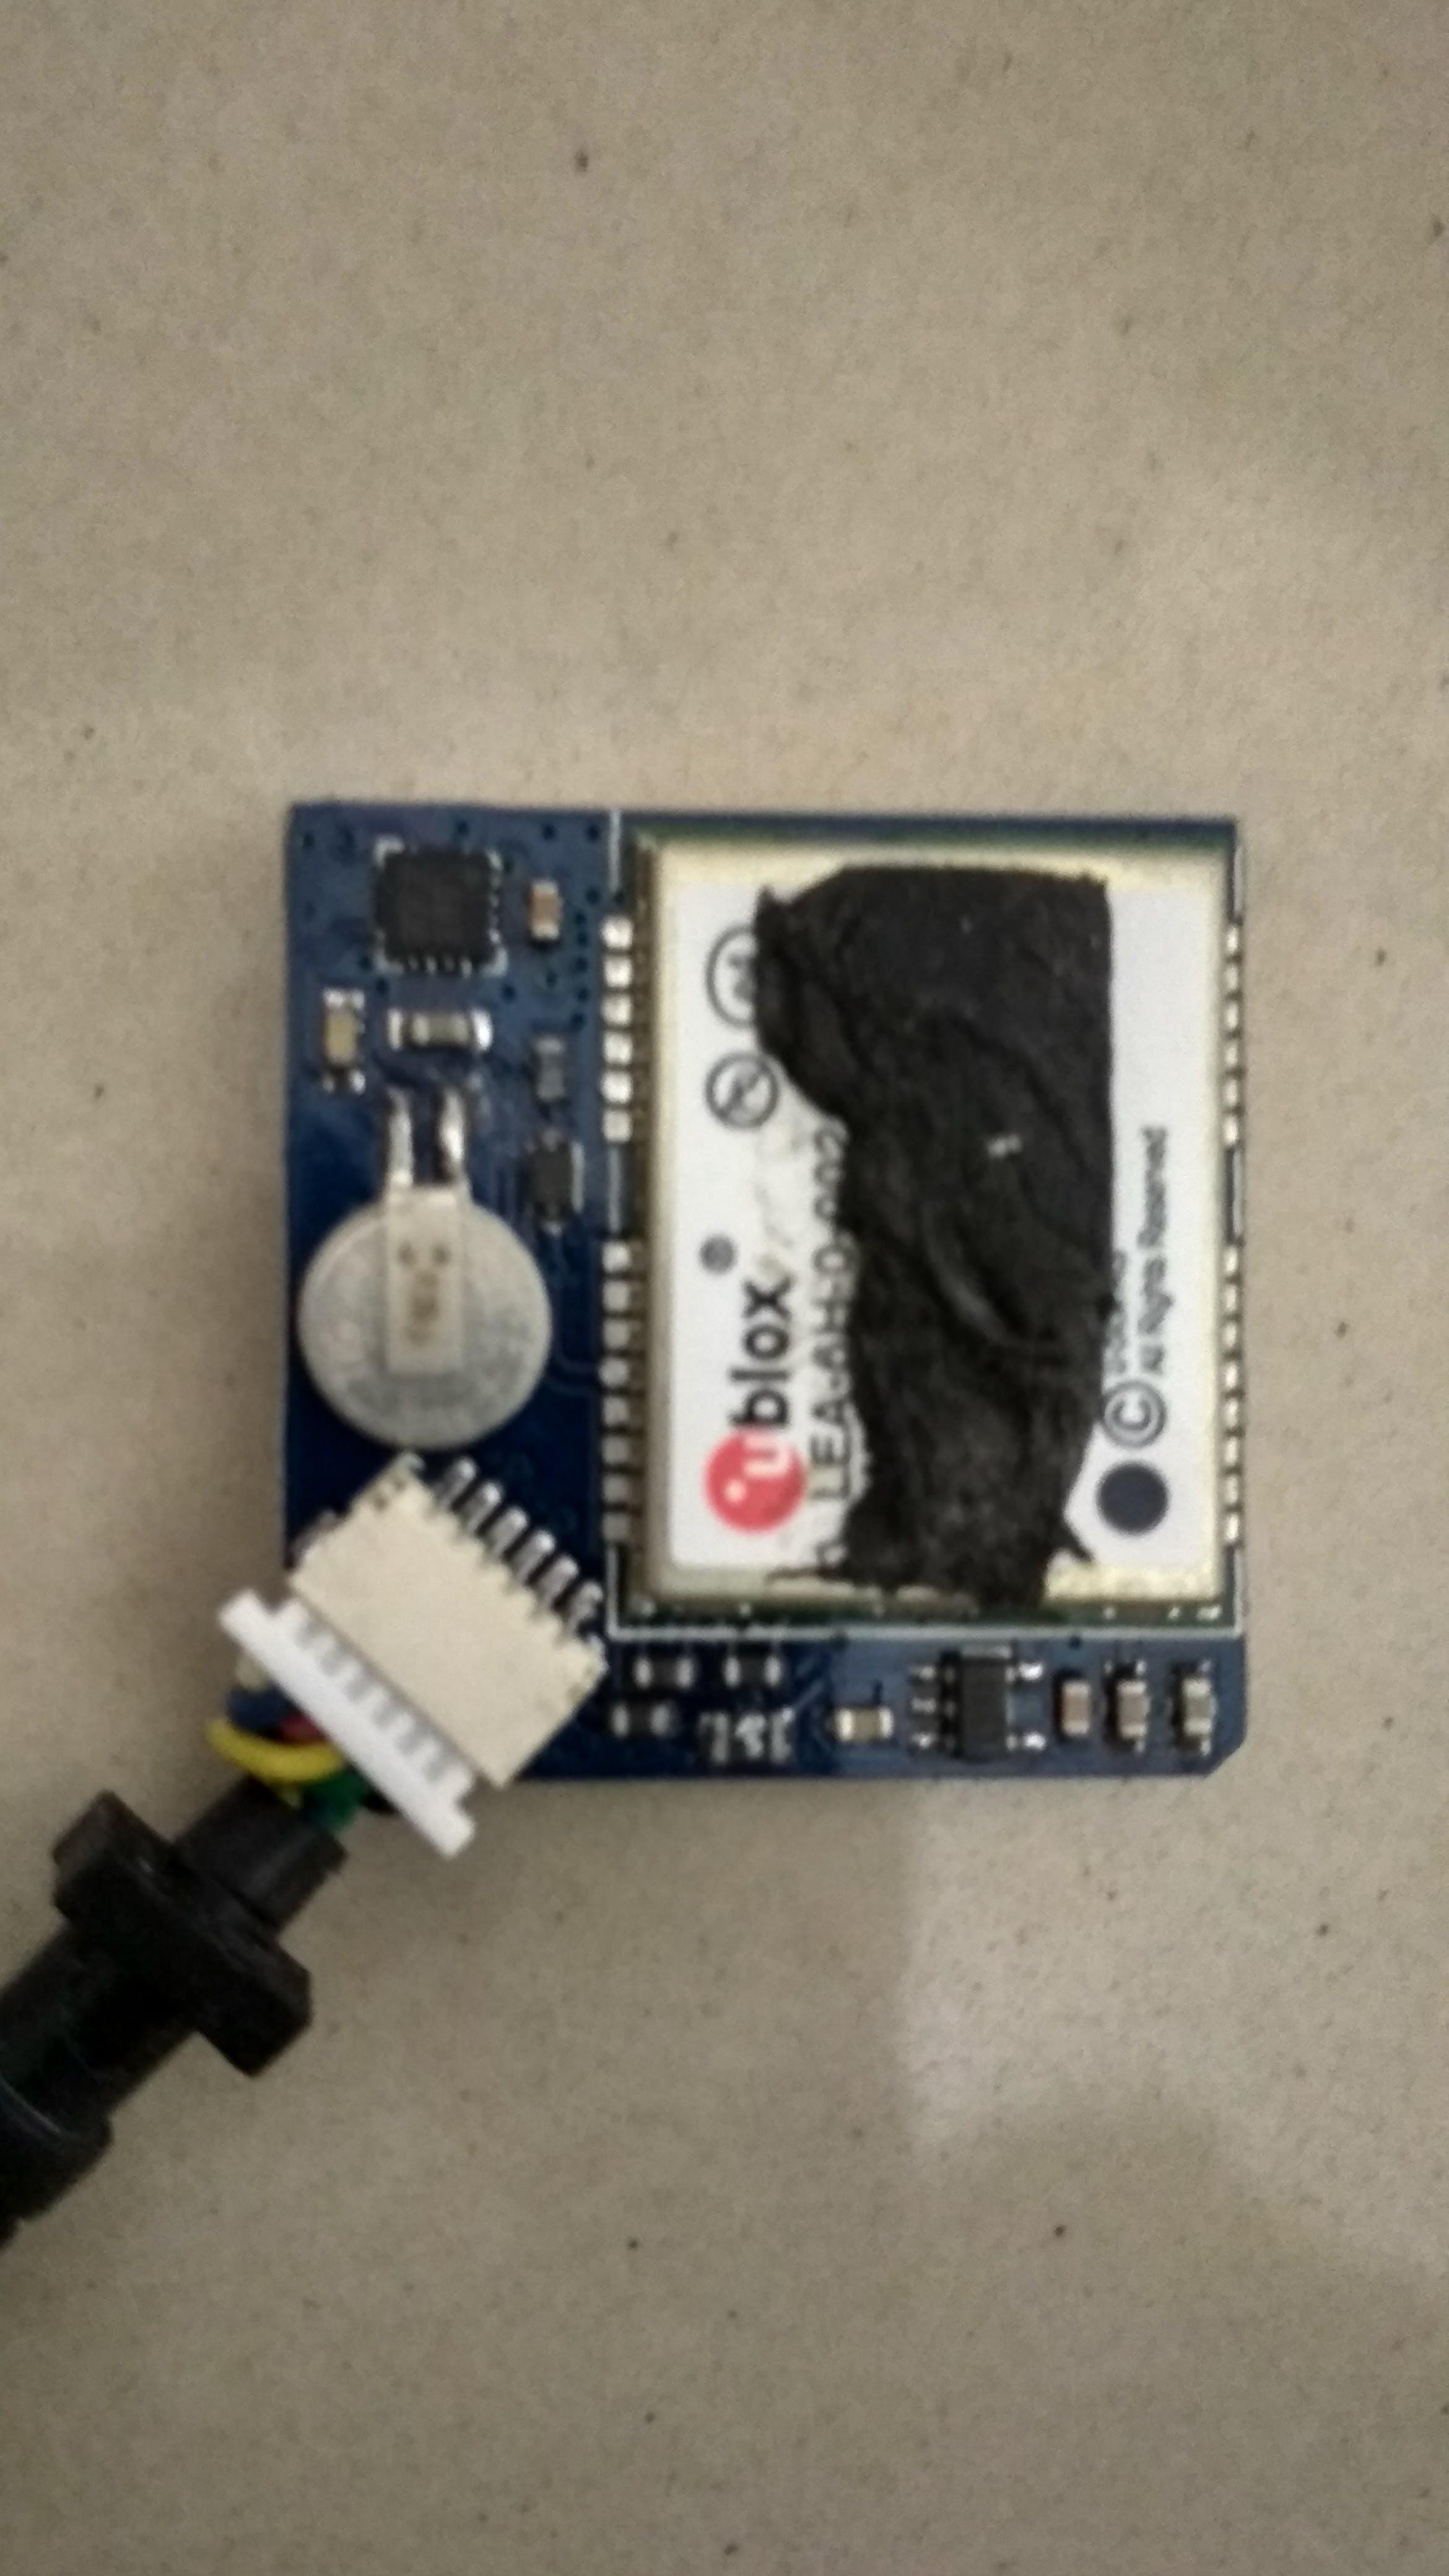 u-blox LEA-6H 02 GPS Module with Arduino and Python